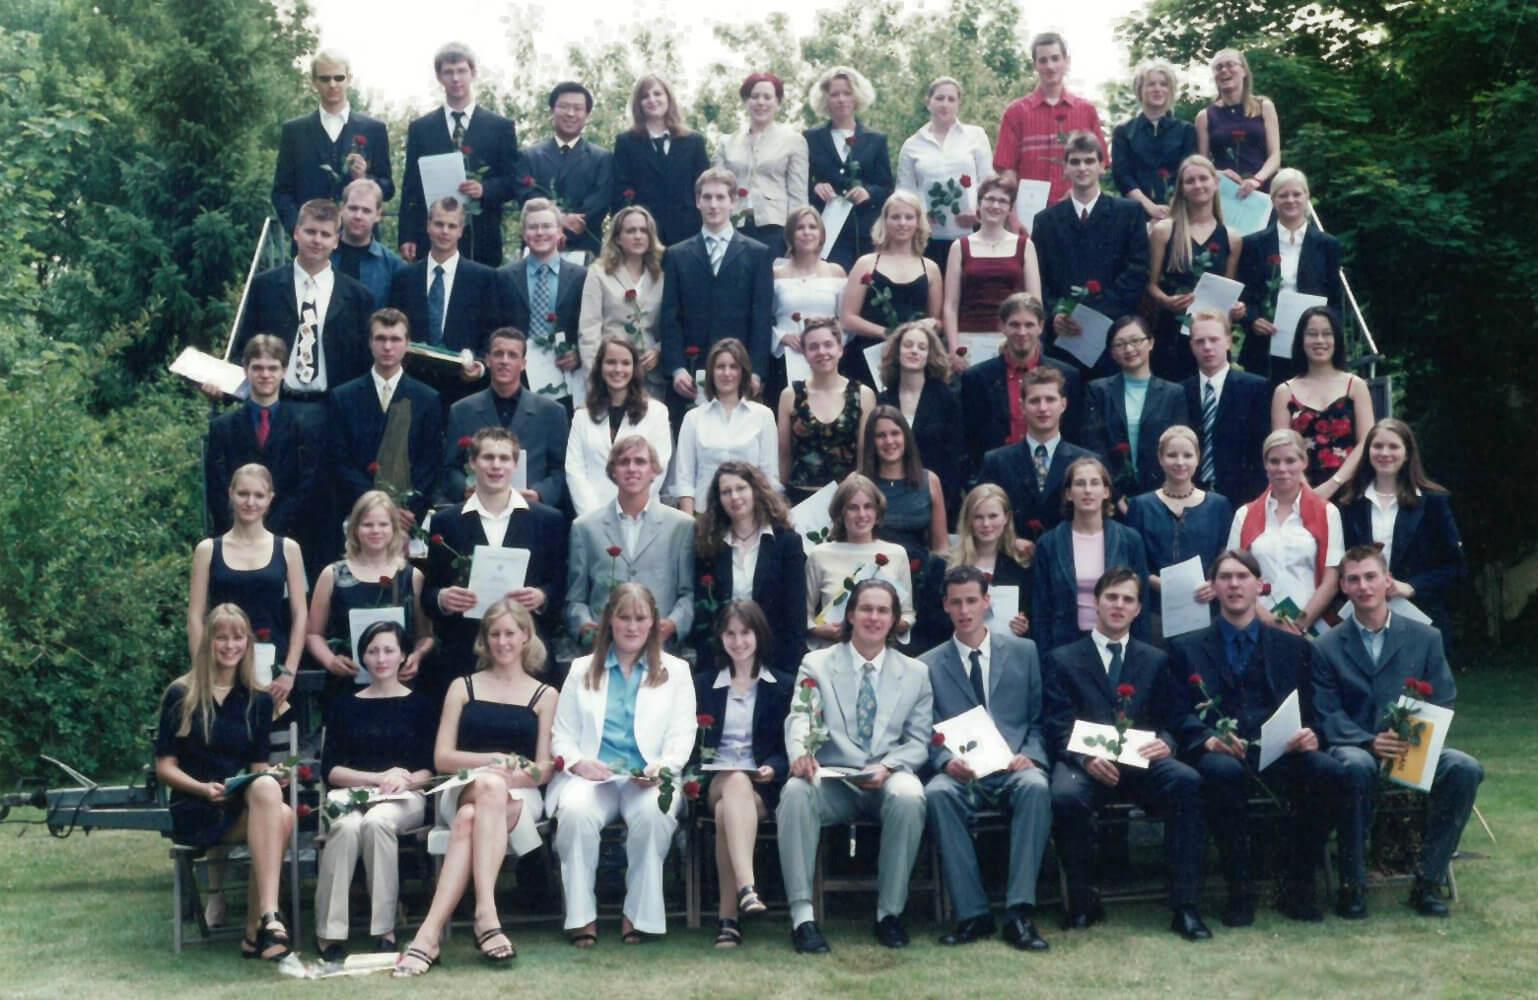 Abitur 2003 Jahrgangsbild